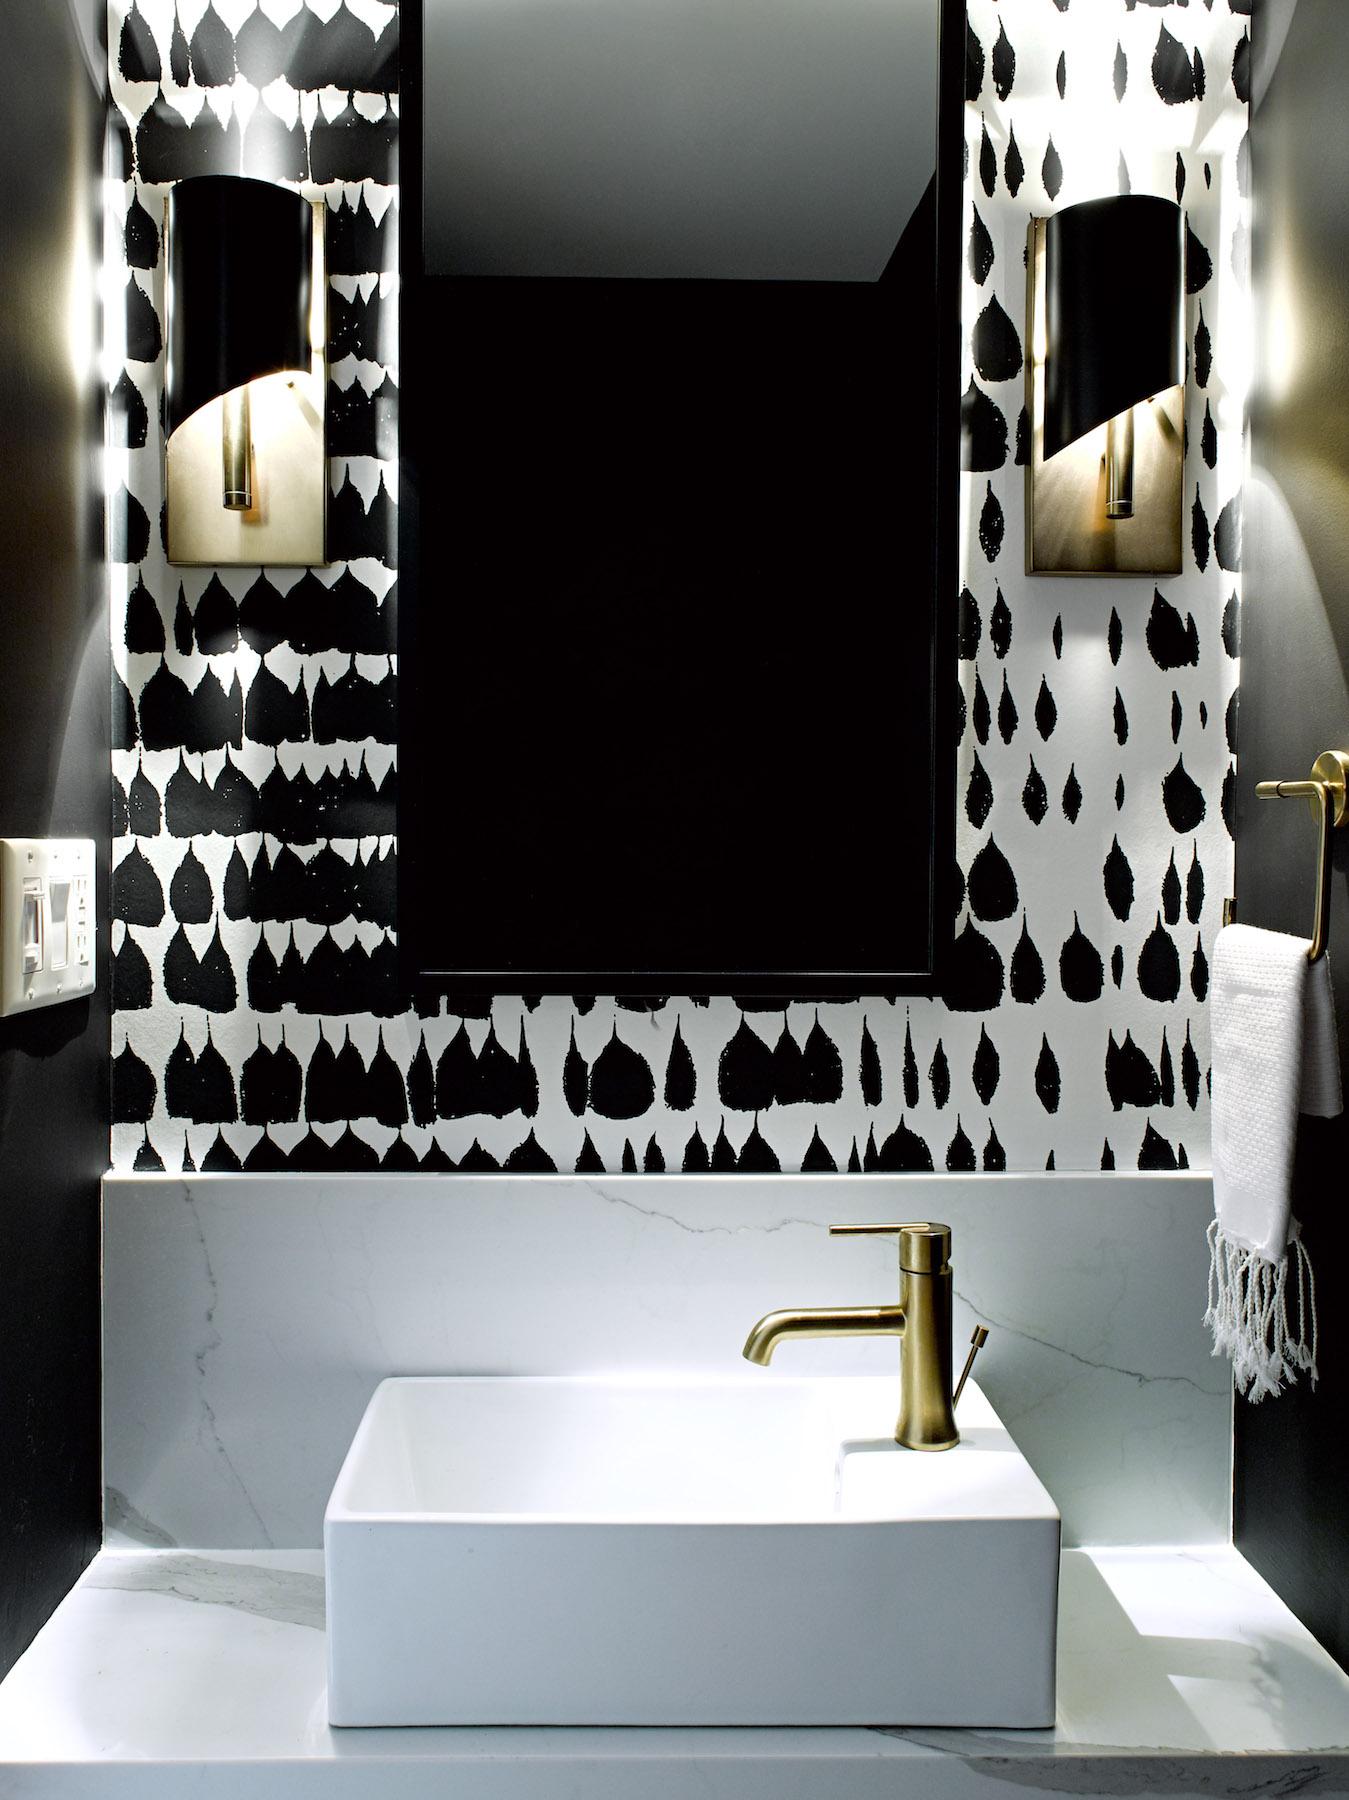 White and Black Powder Room